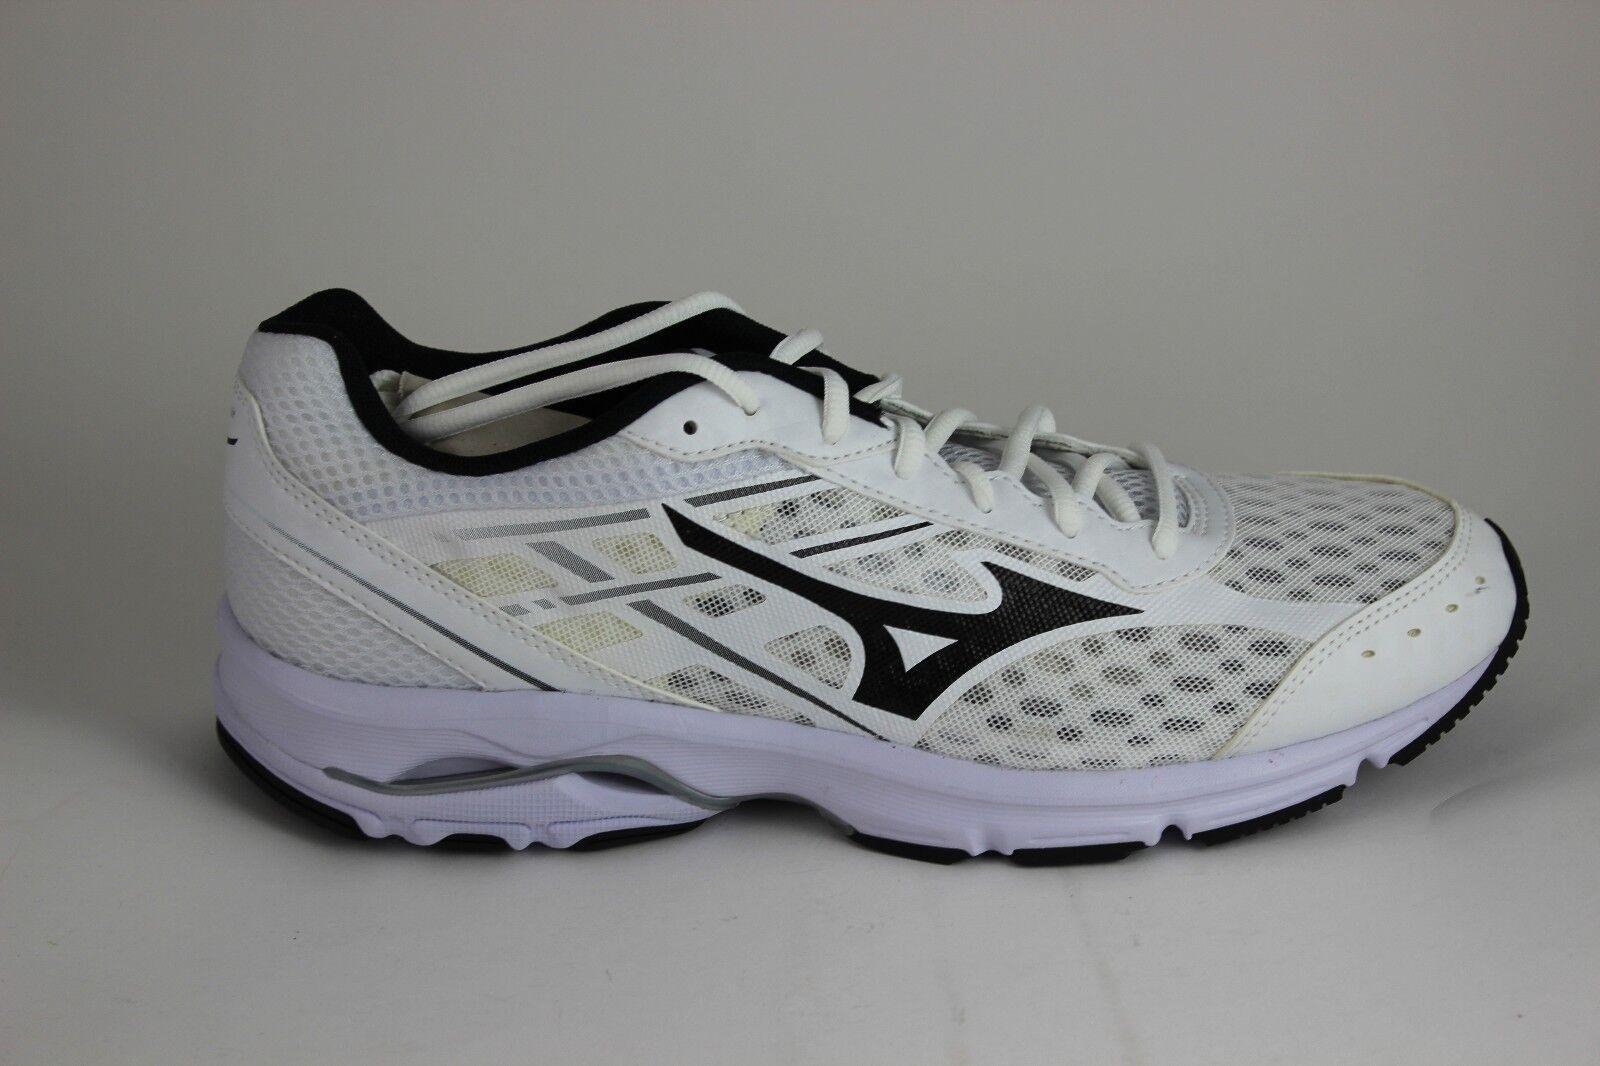 Men's  Wave Unite 2 Sneakers White-Black 320472.0090 Brand New in Box